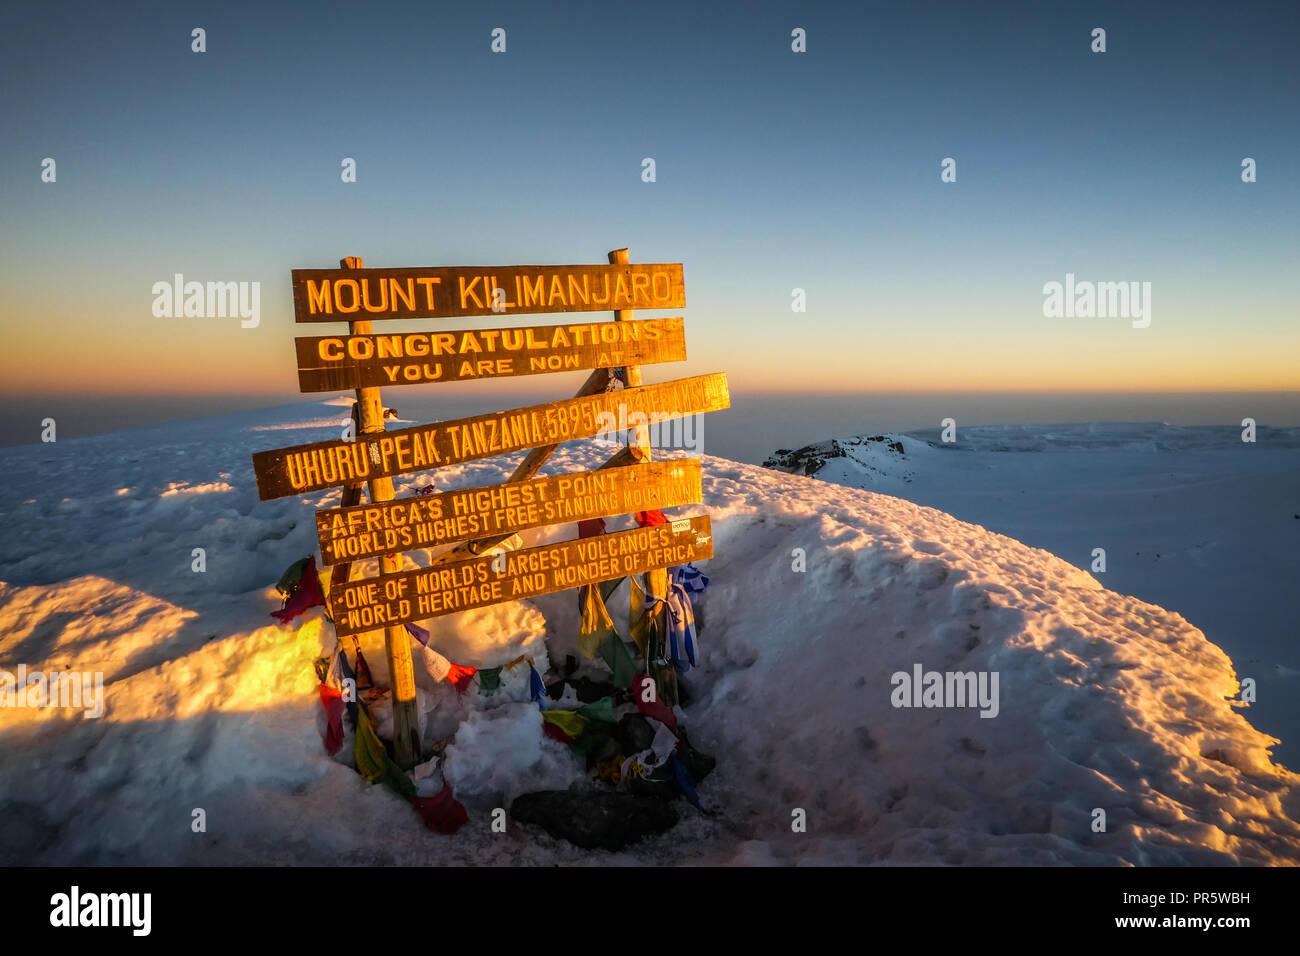 Kilimanjaro Tanzania Africa - Stock Image